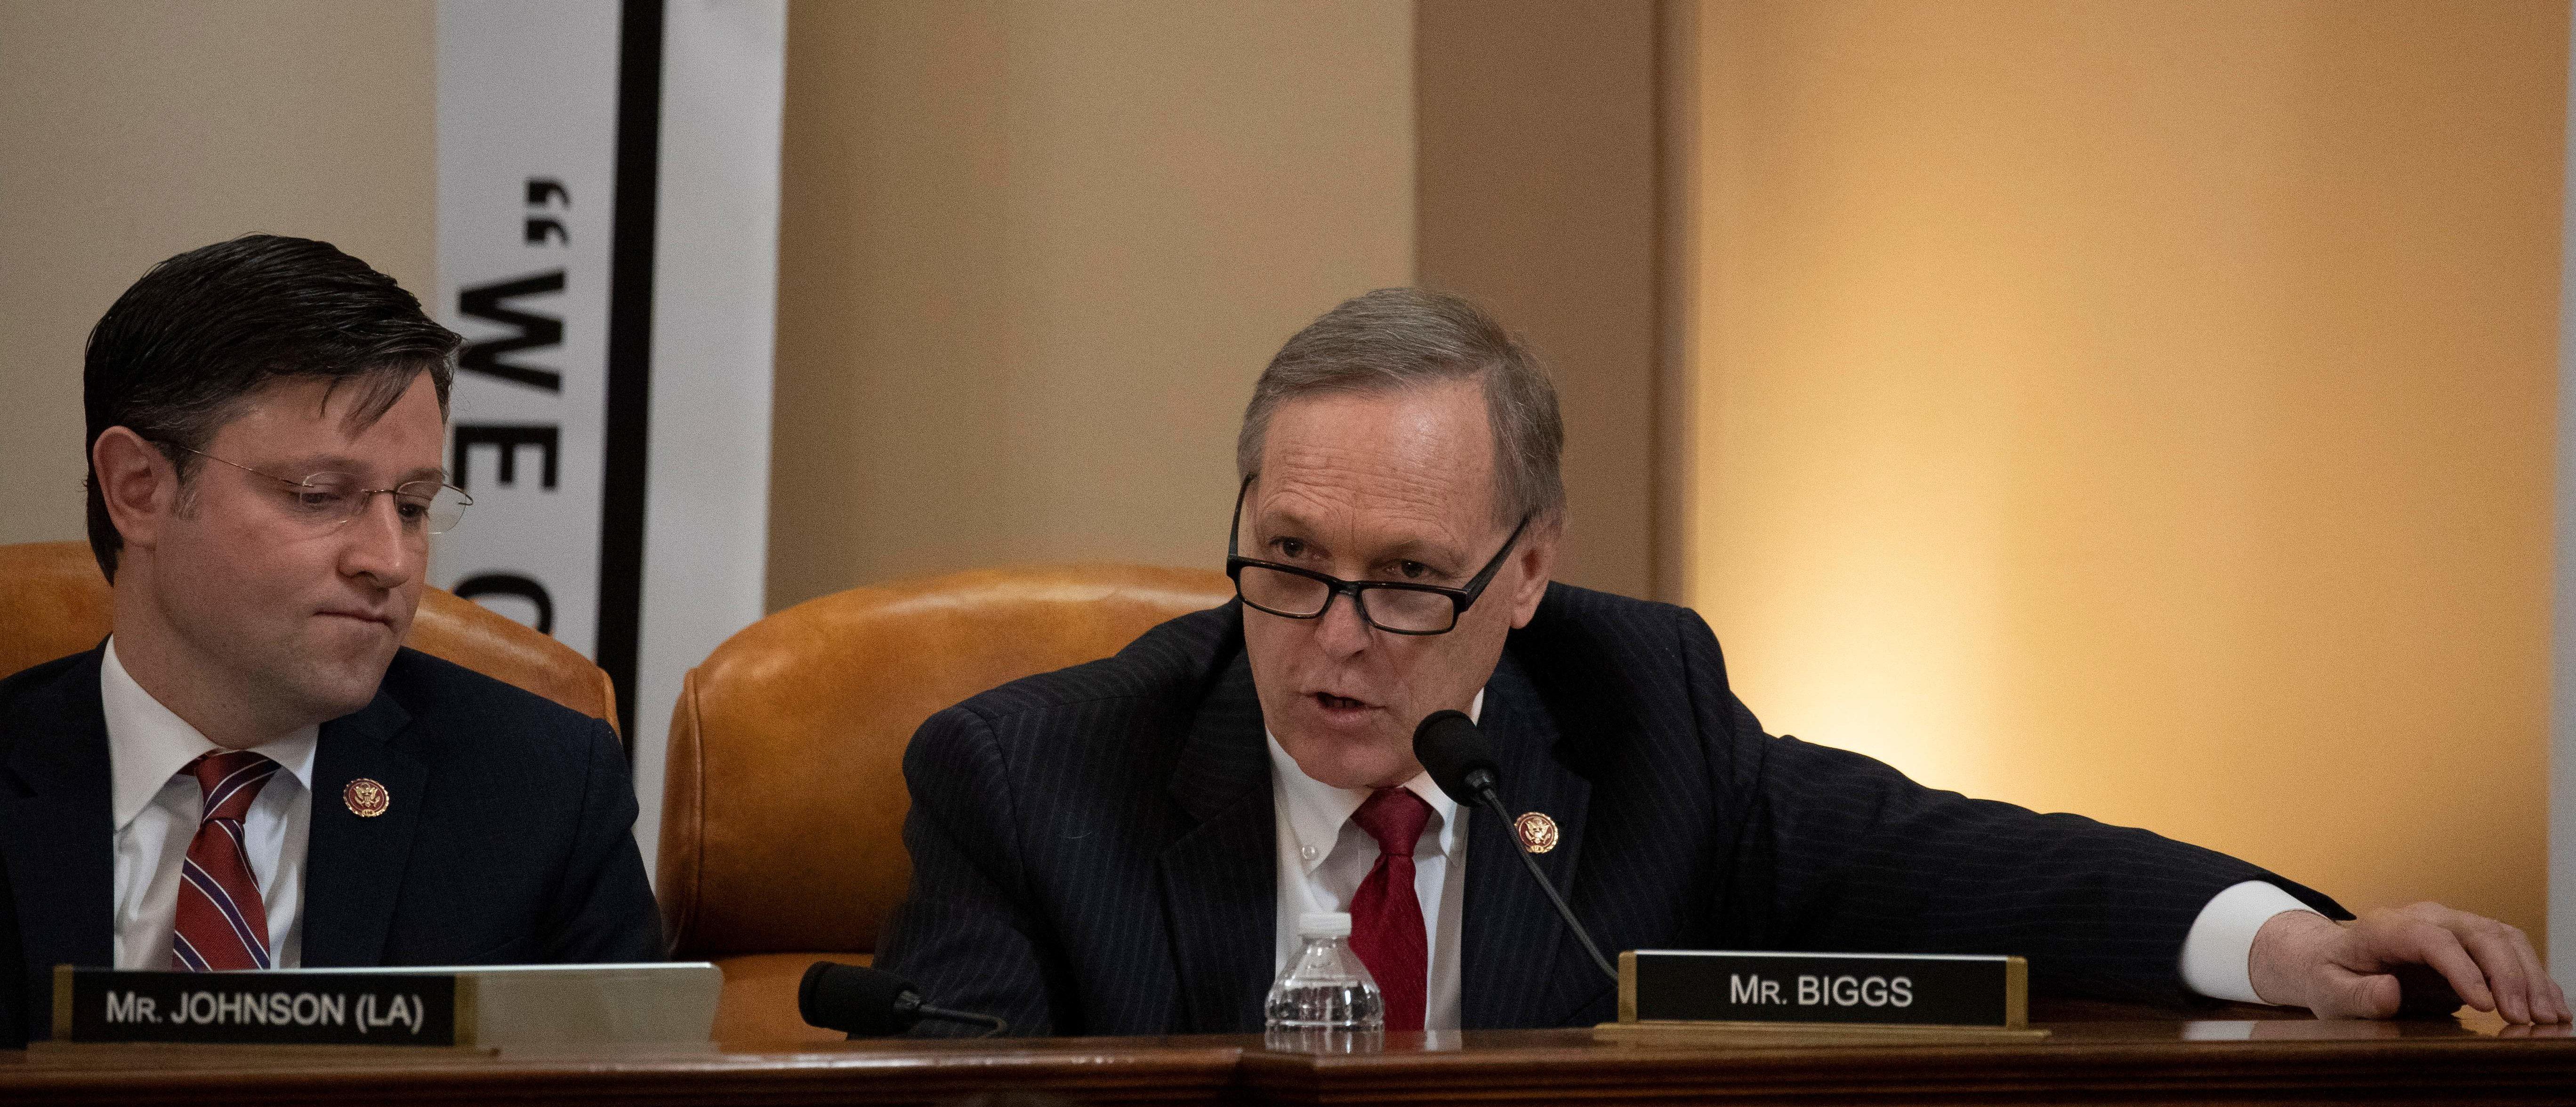 Rep. Andy Biggs Pushes Bill To Free Medical Innovators From Unnecessary Regulations, Help Combat Coronavirus